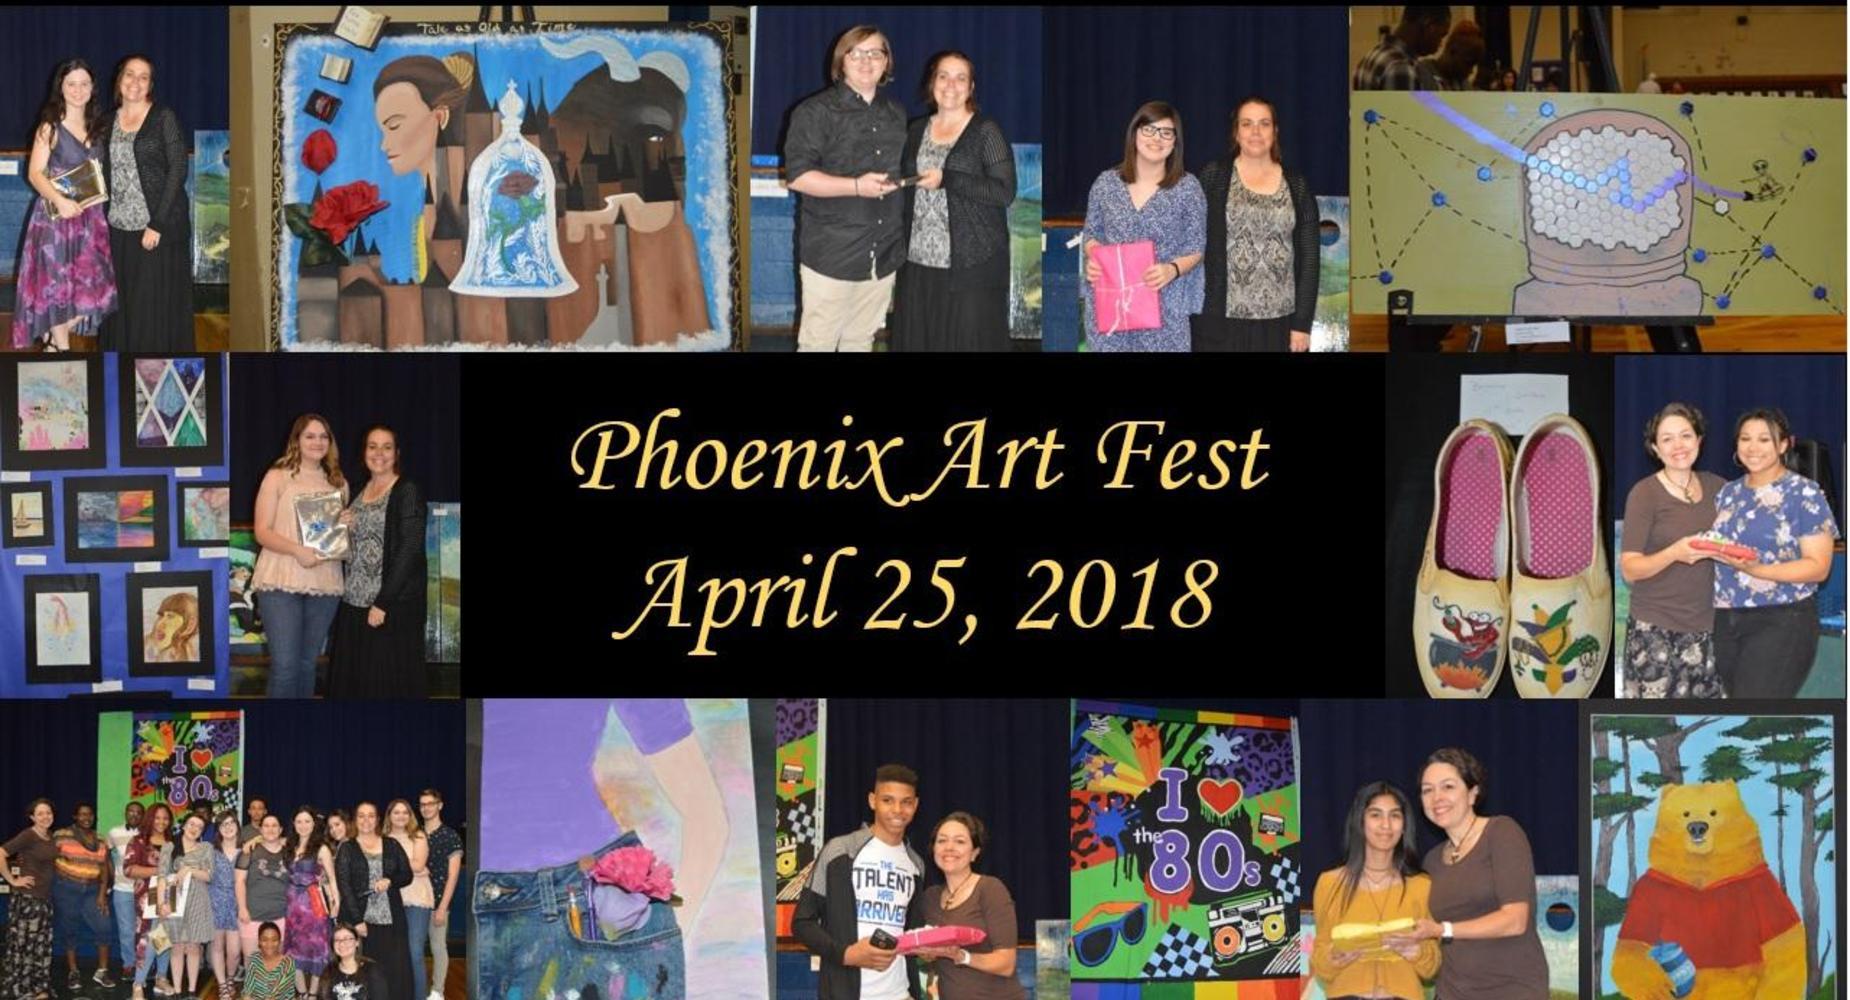 Phoenix Art Fest